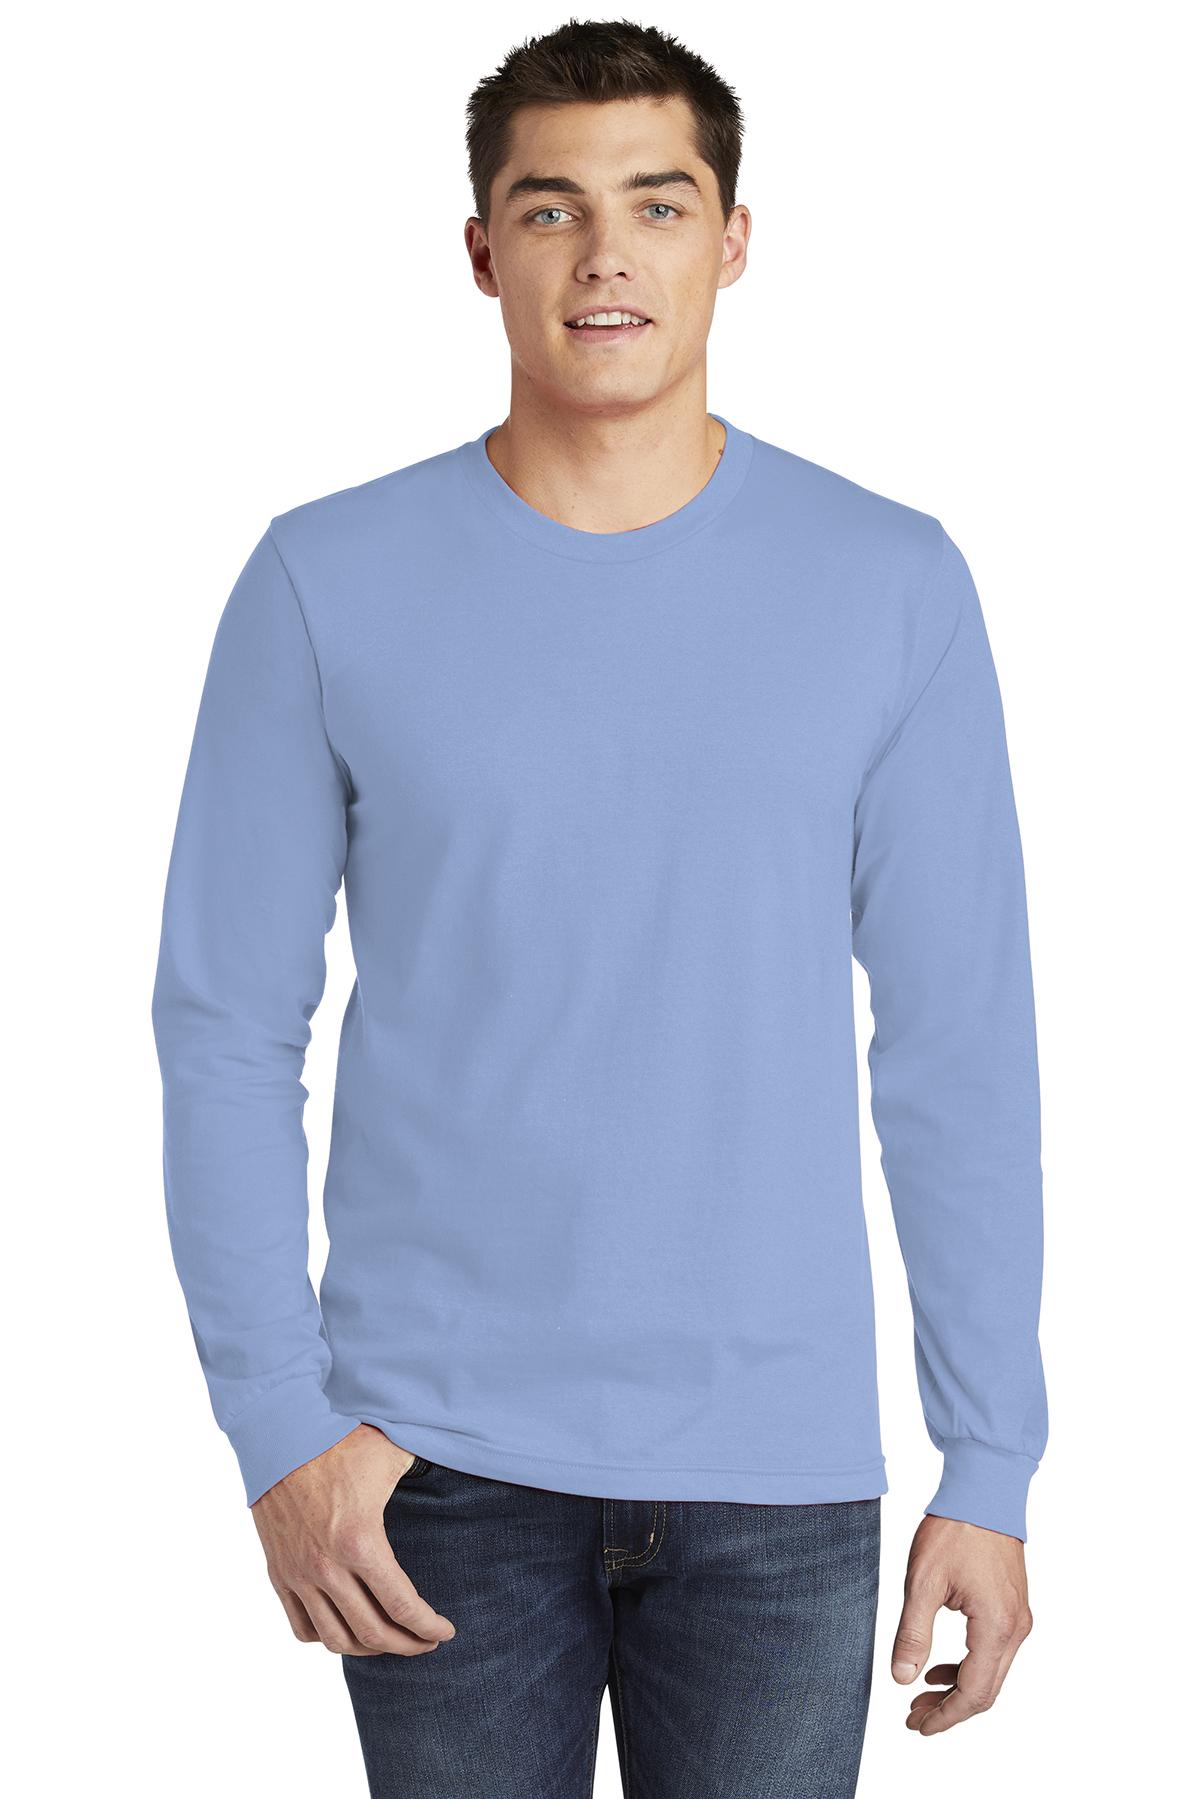 American Apparel Fine Jersey Long Sleeve T-Shirt-White